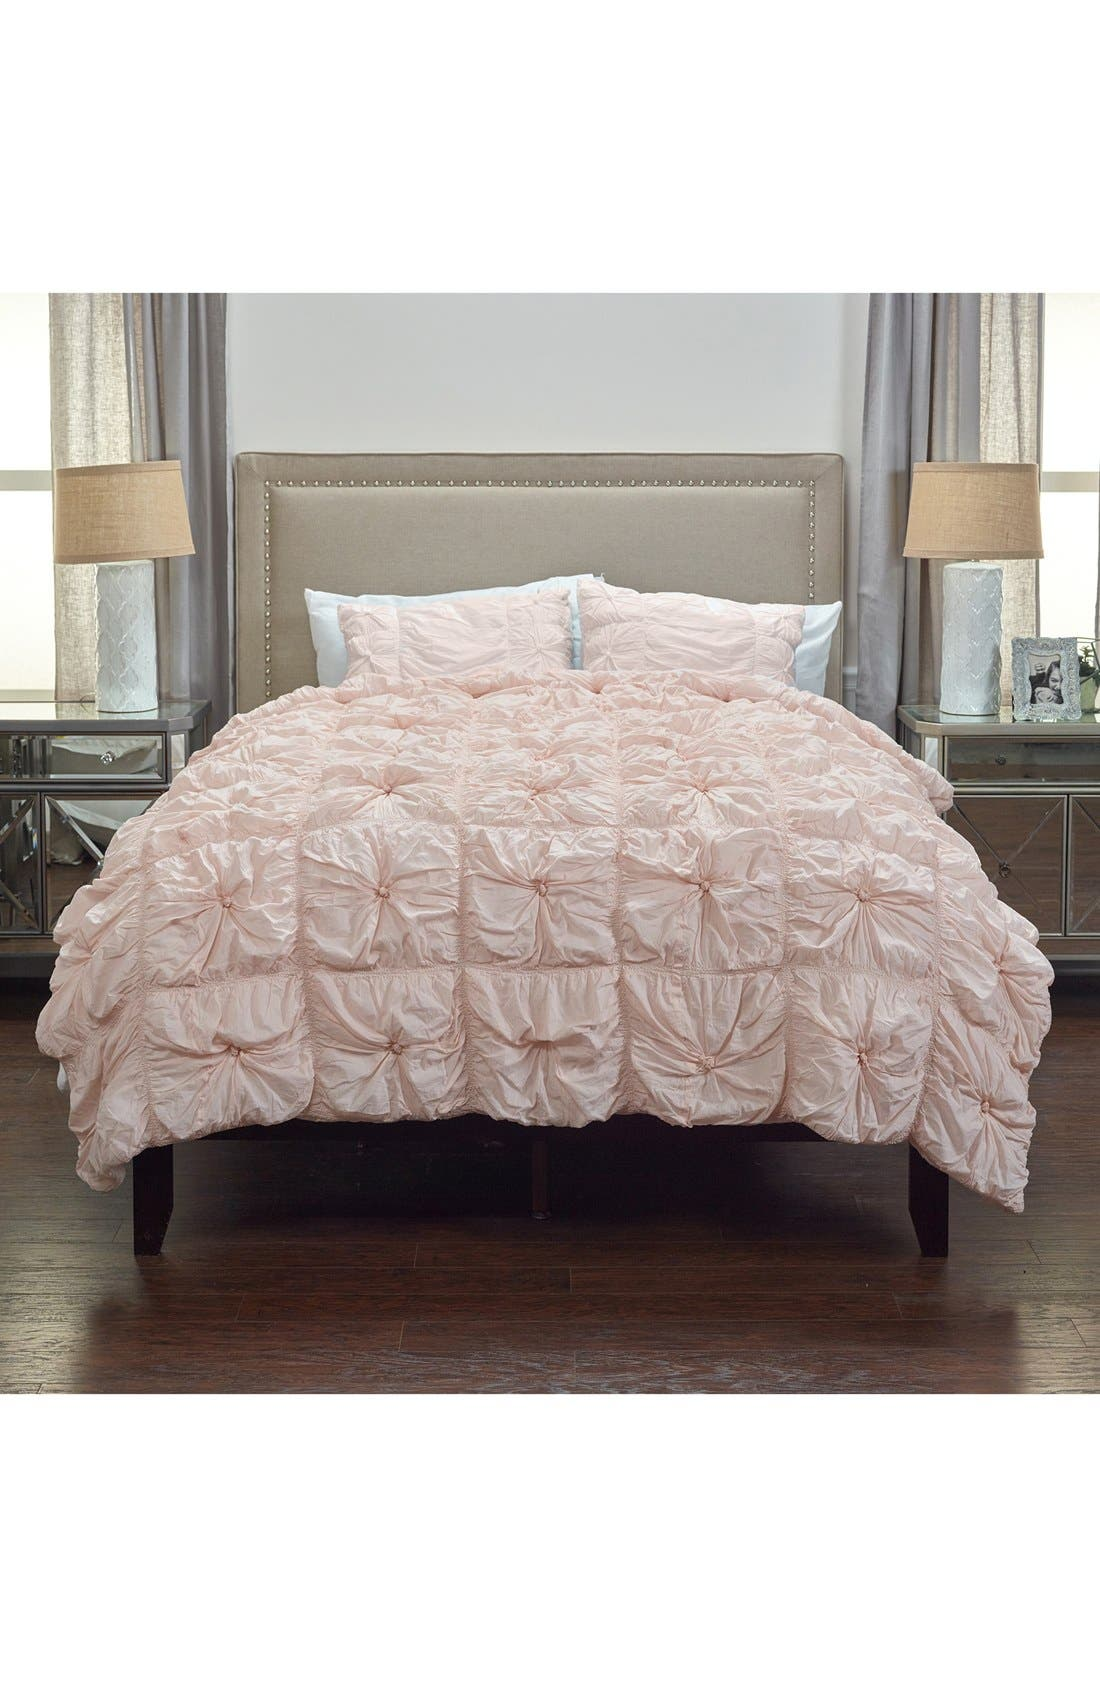 Rizzy Home Knots Comforter & Sham Set